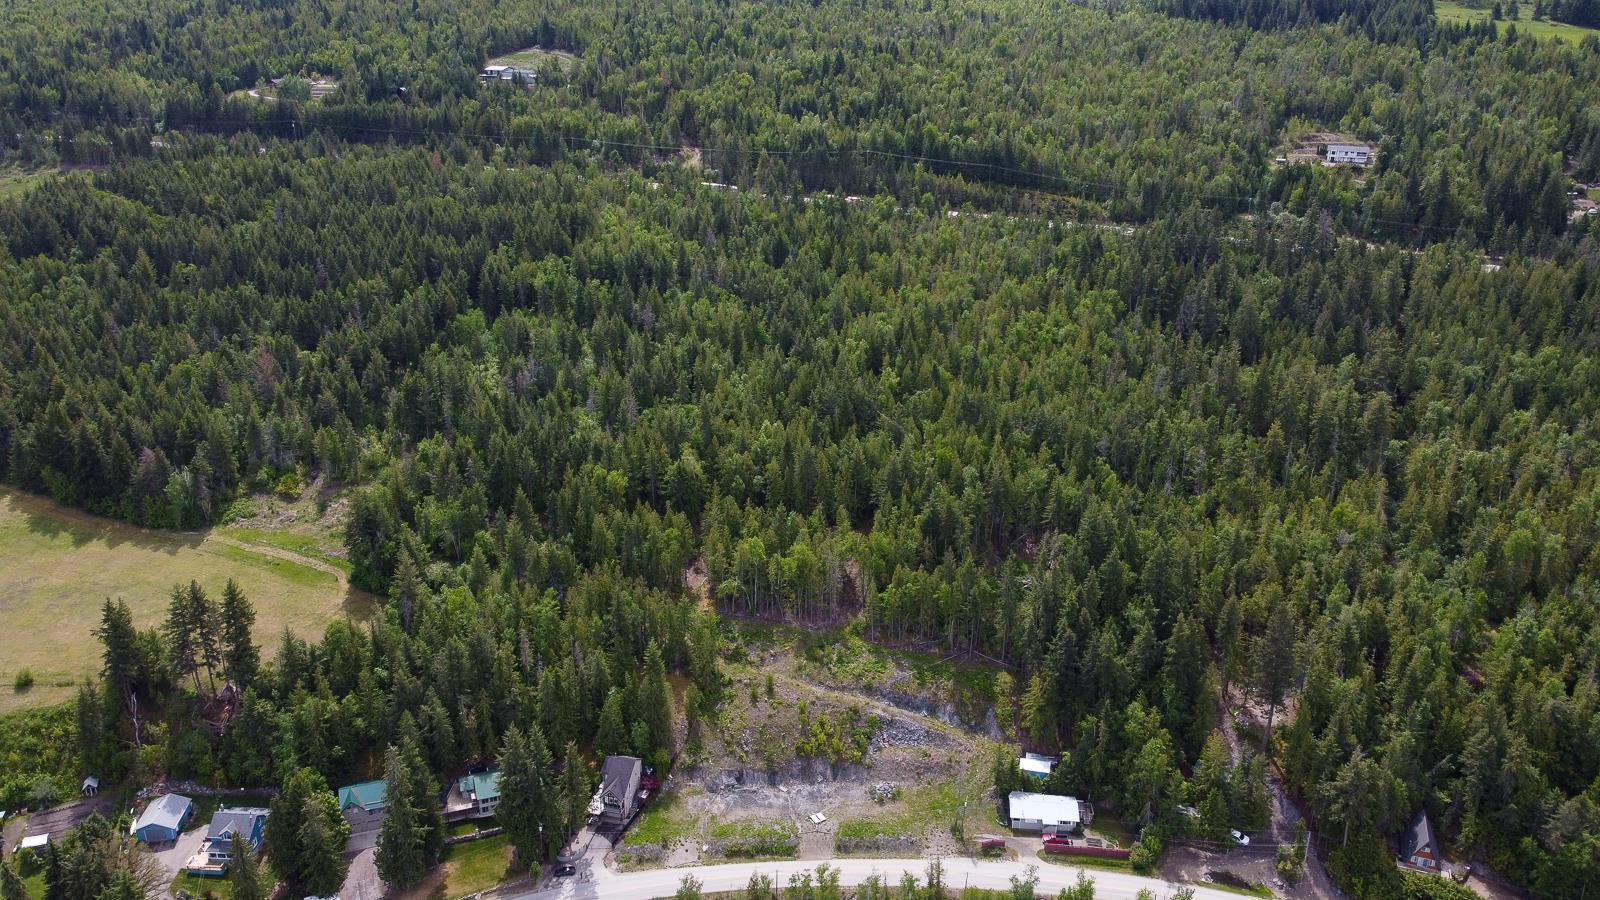 Lot 1-5 Blind Bay Road,, Blind Bay, British Columbia  V0E 1H0 - Photo 19 - 10232466